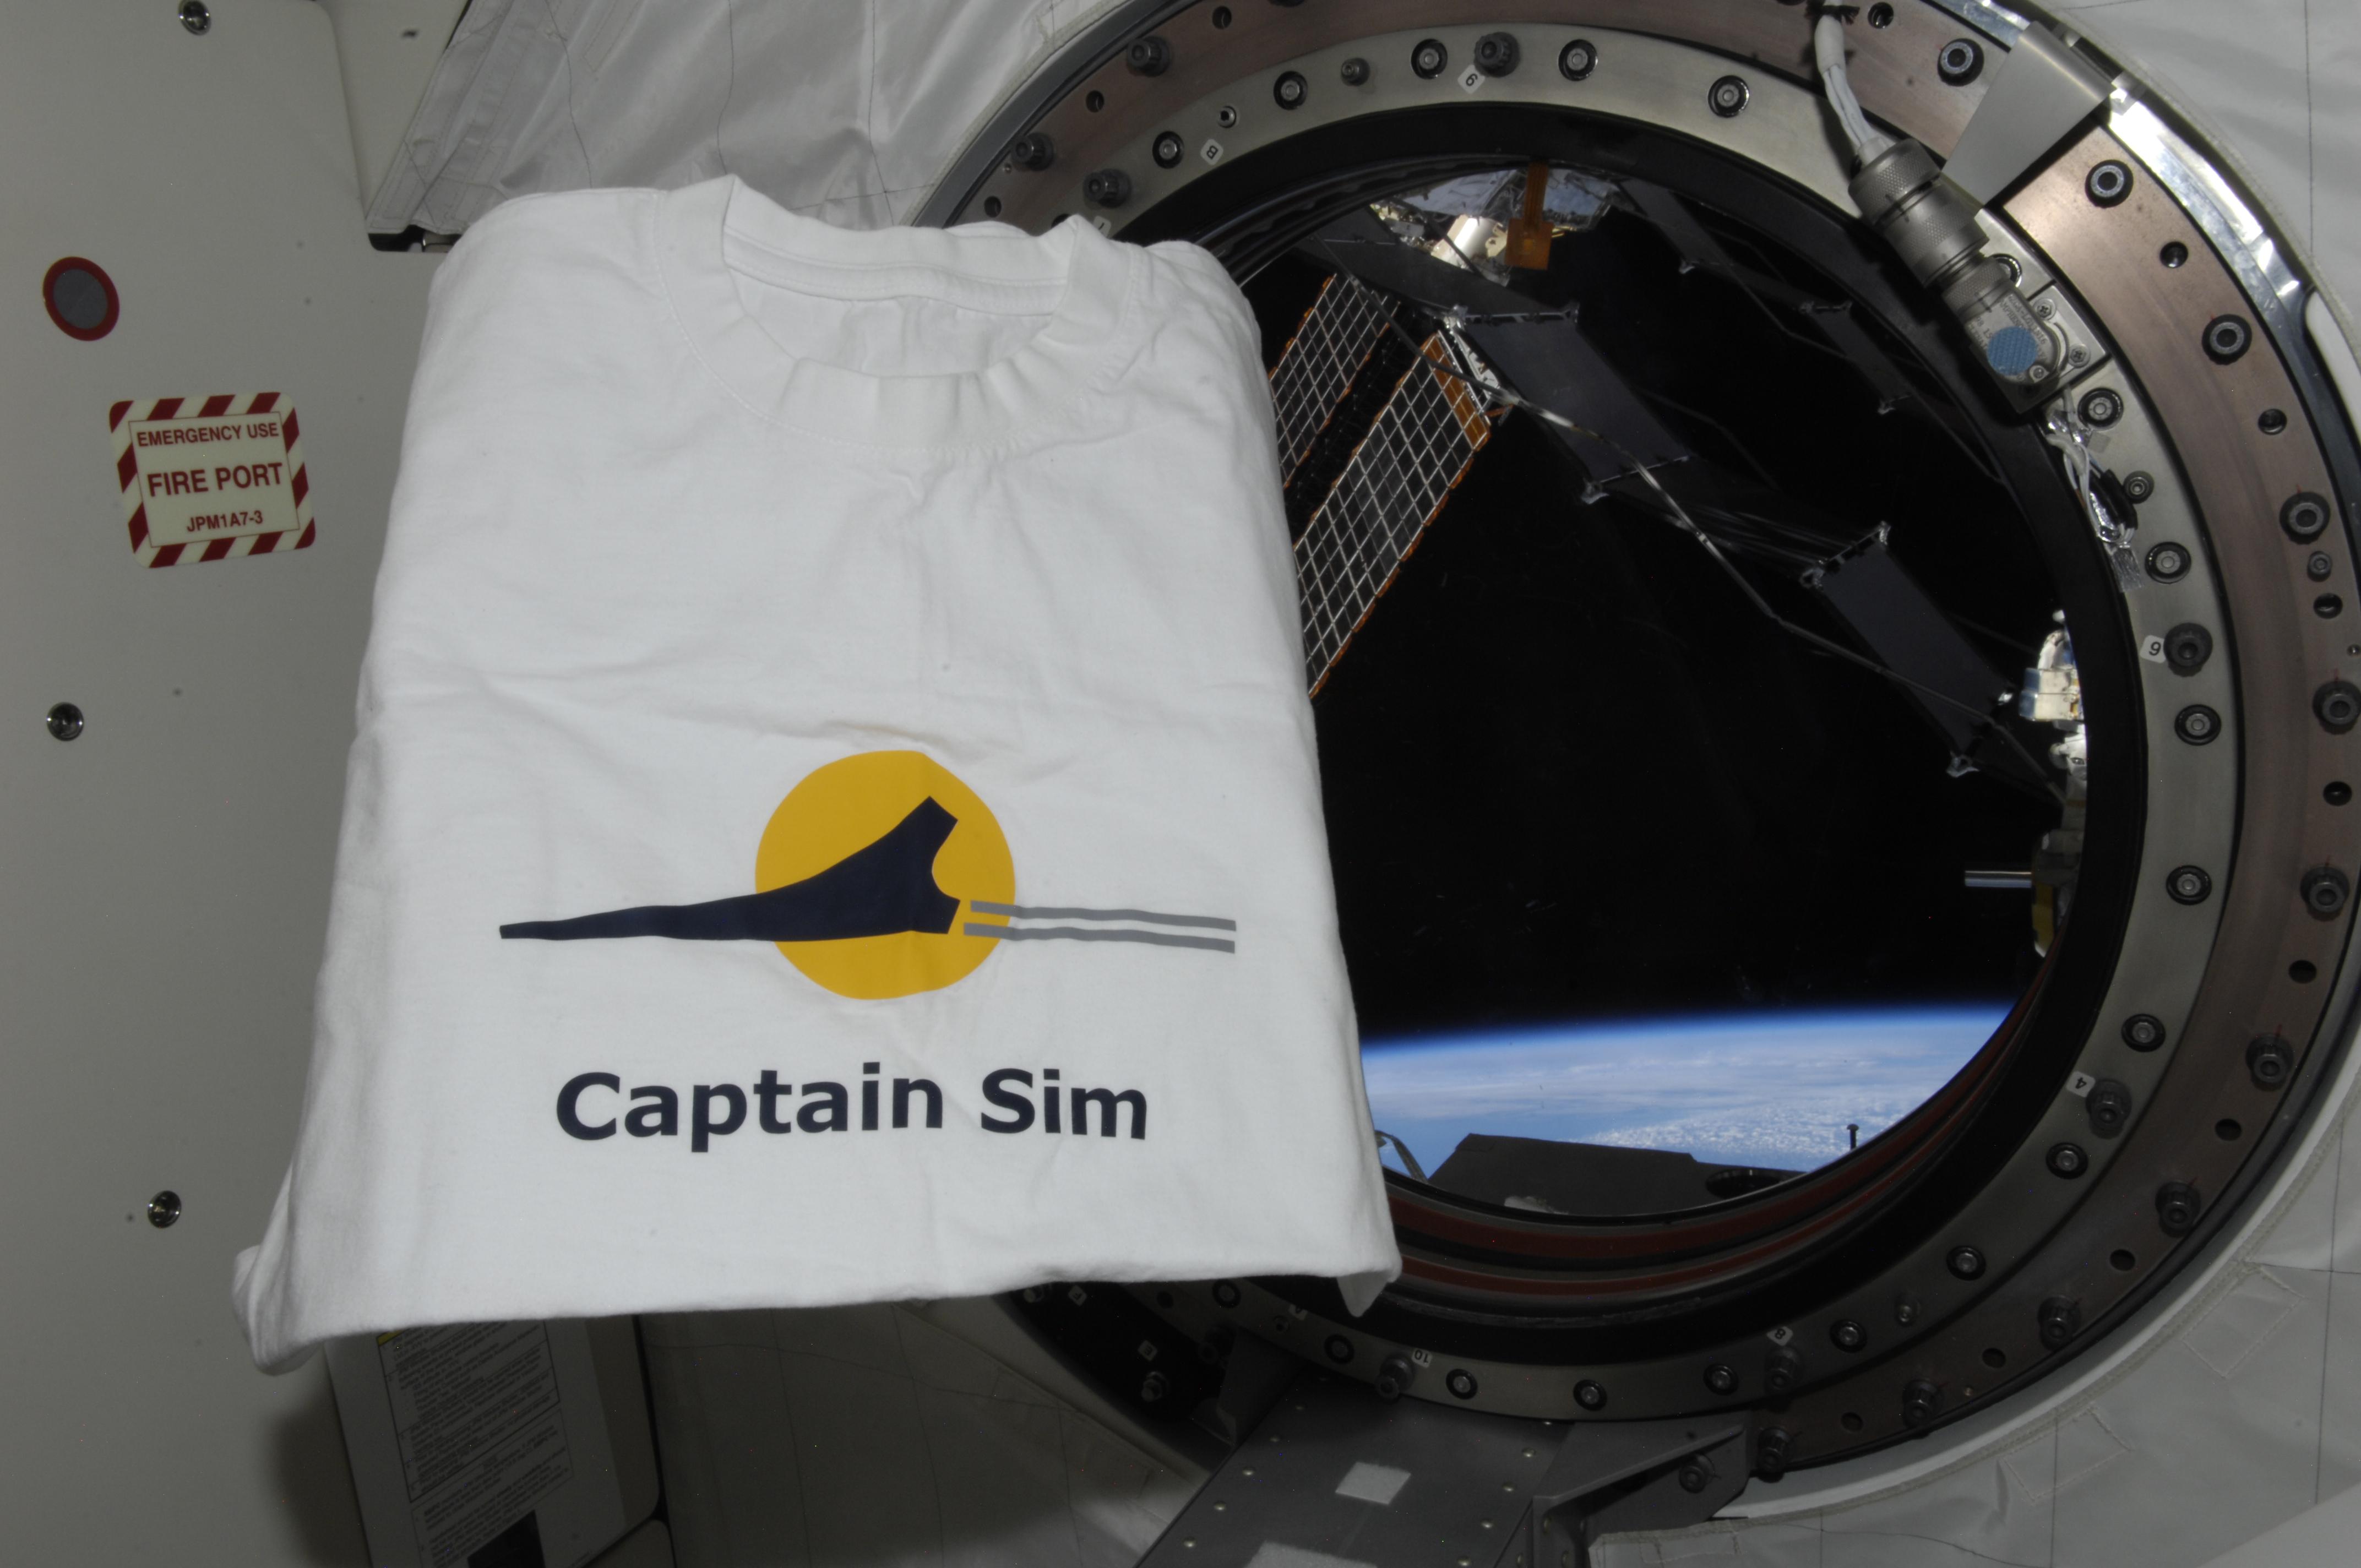 captain sim space shuttle - photo #33